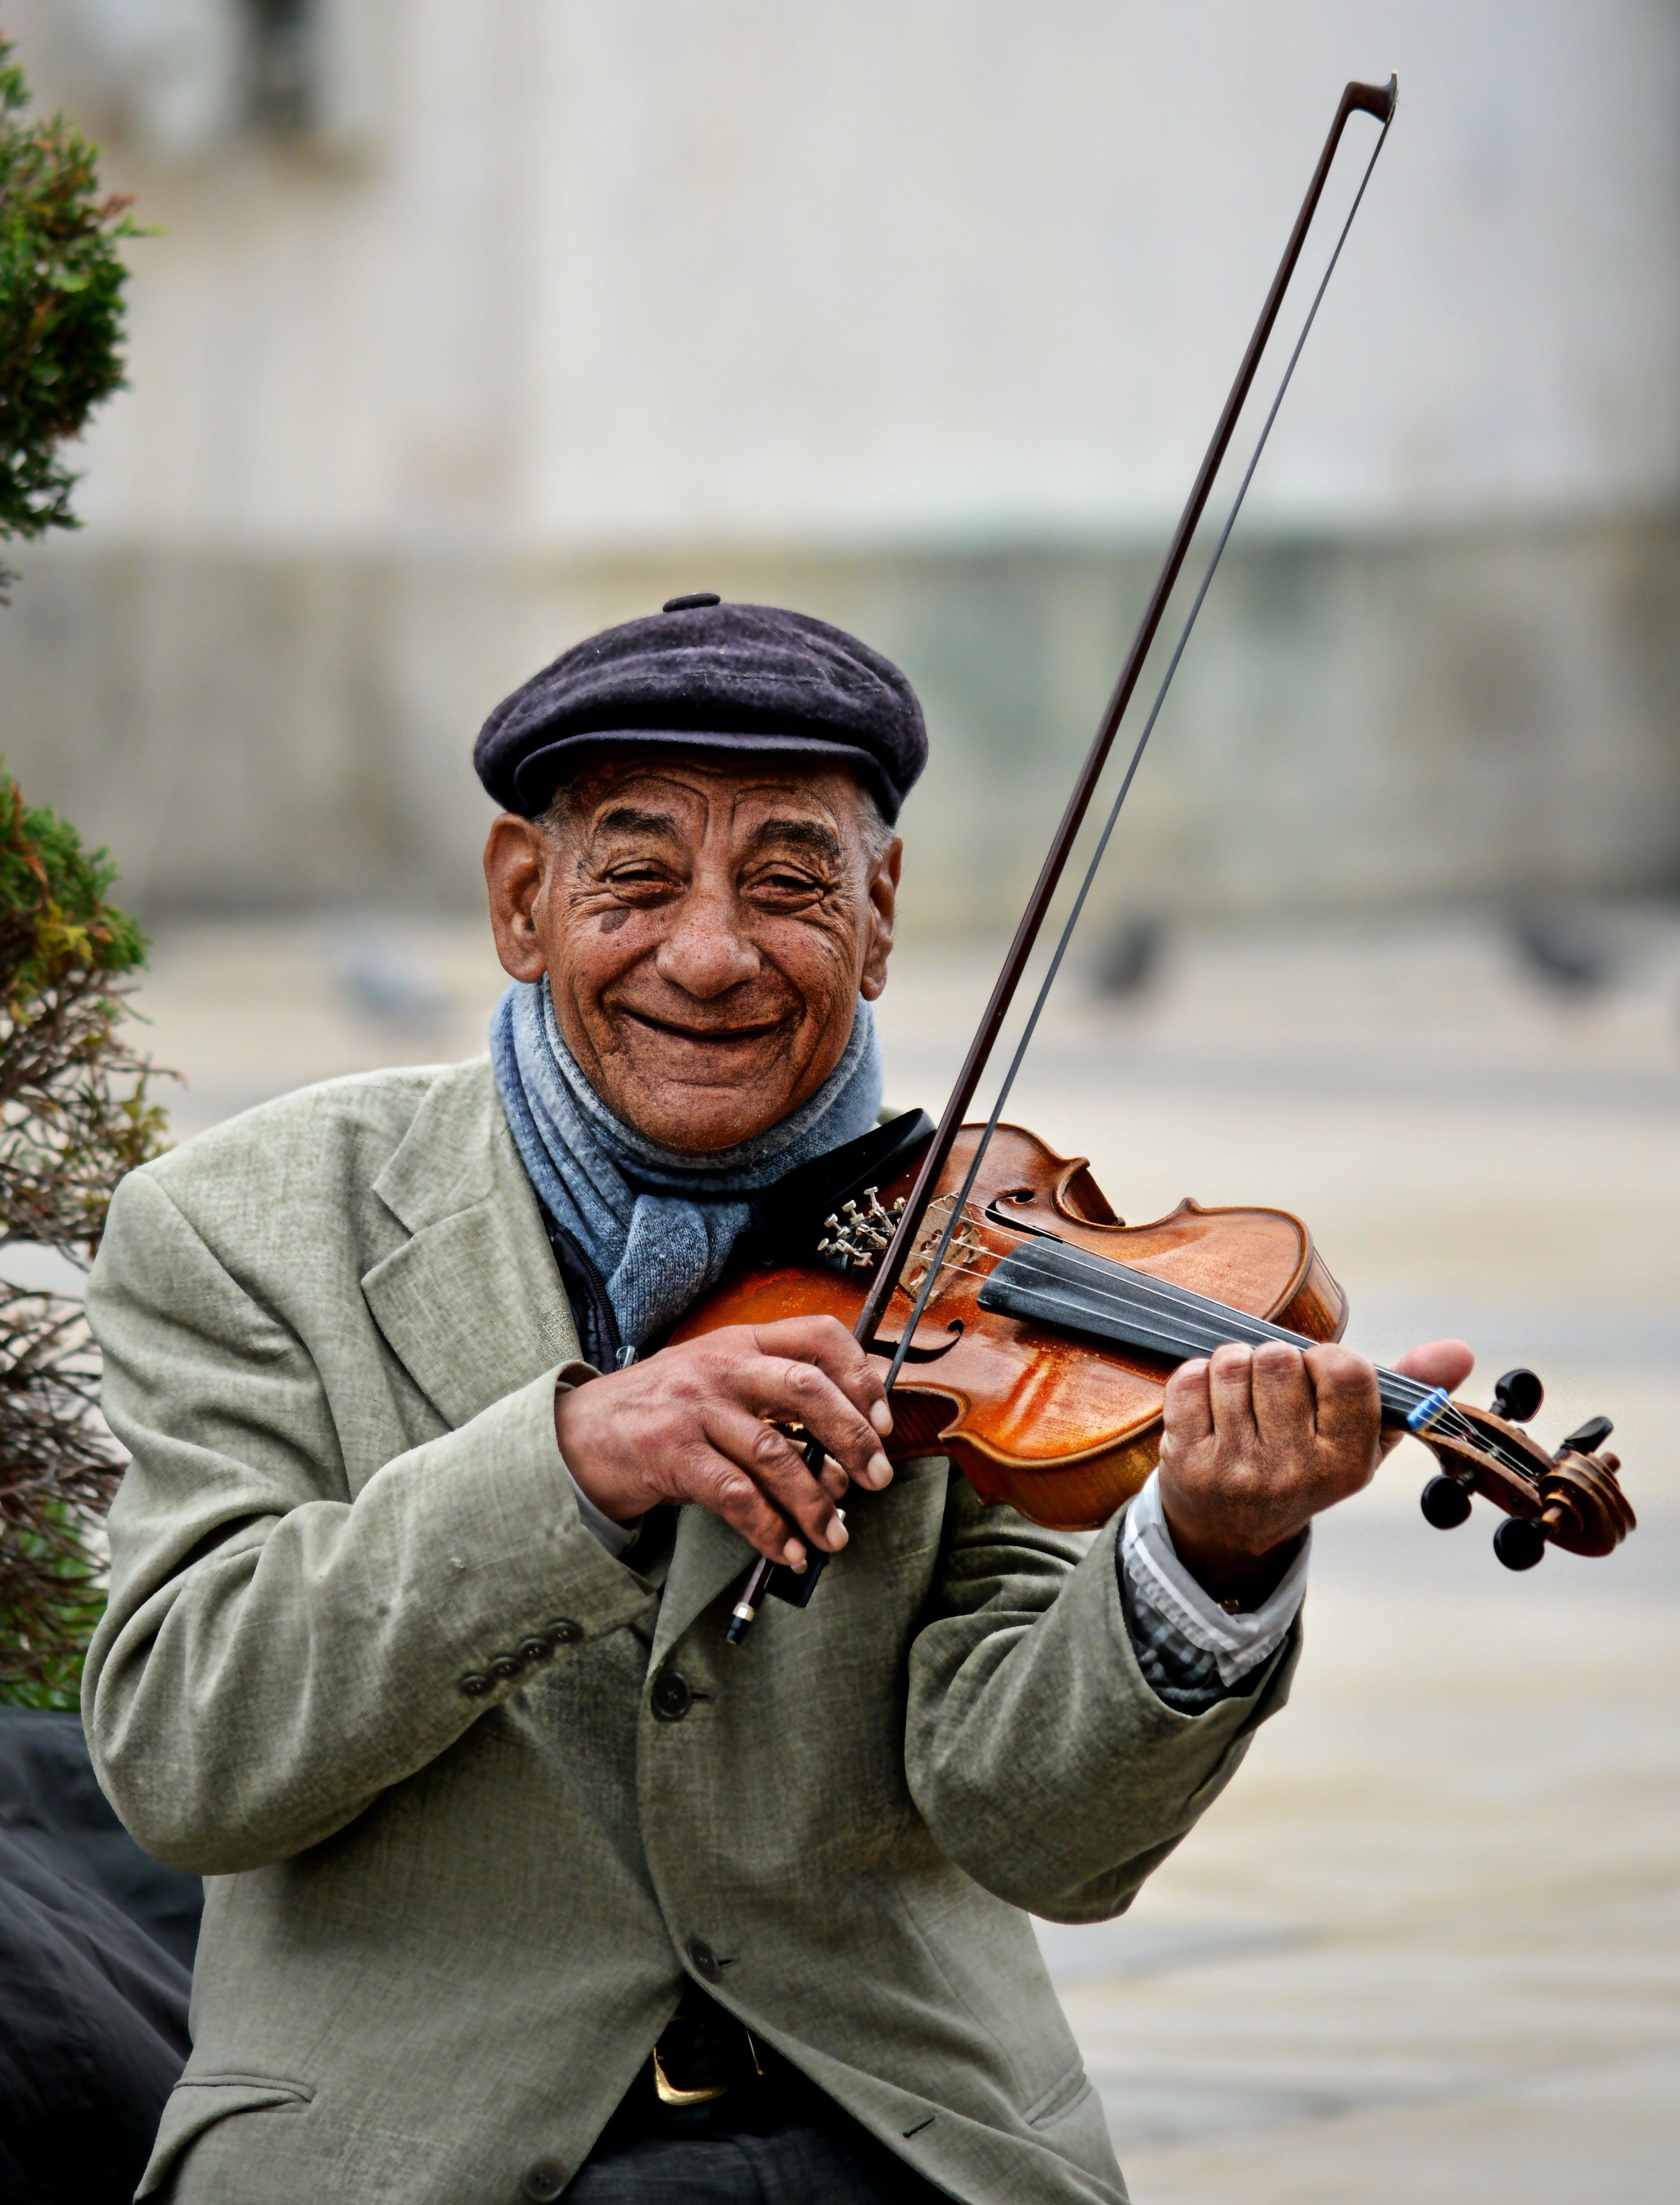 Free stock photo of street, musician, smile, violin